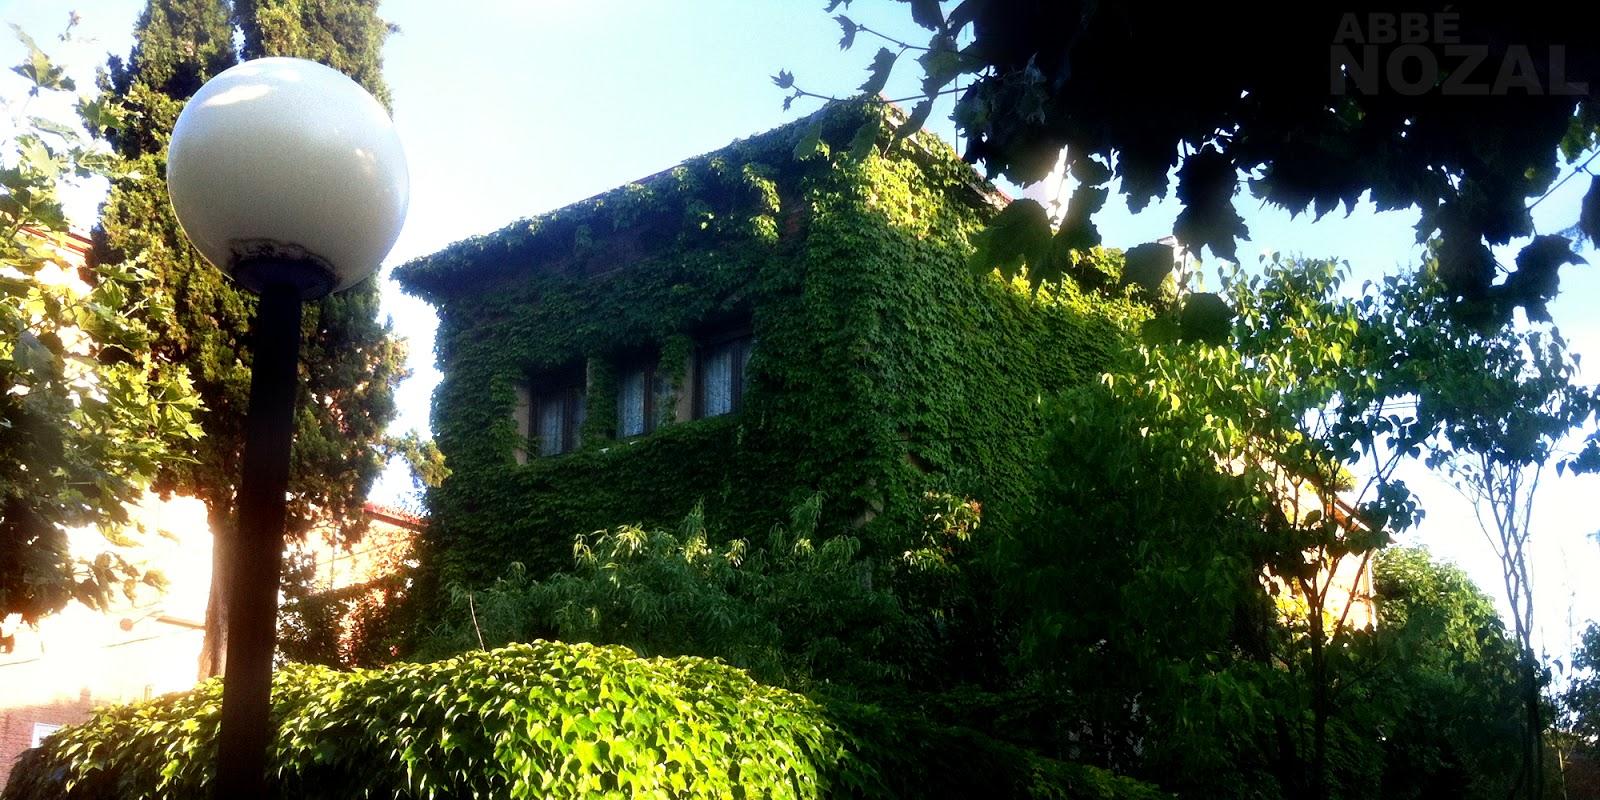 La casa del jardinero, 2014 Abbé Nozal